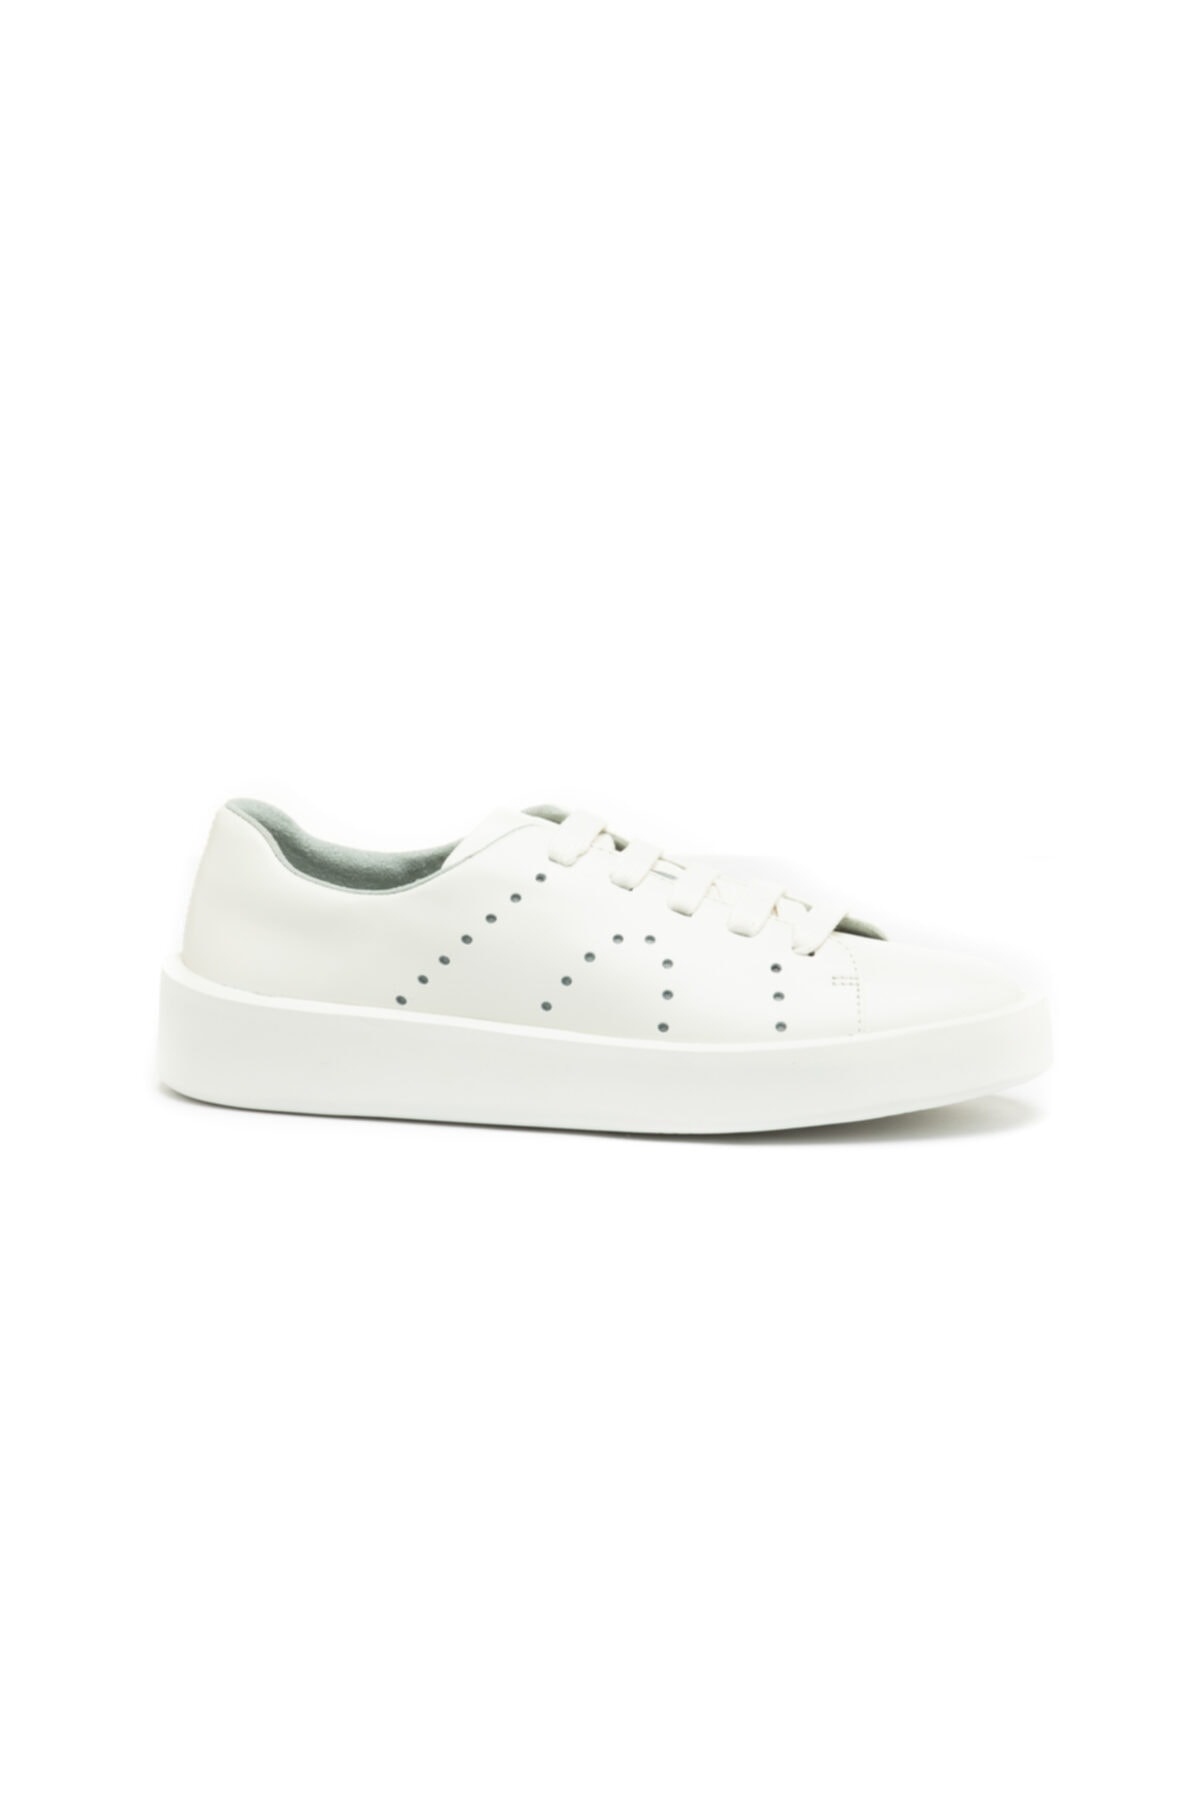 CAMPER Kadın Beyaz Sneaker 1